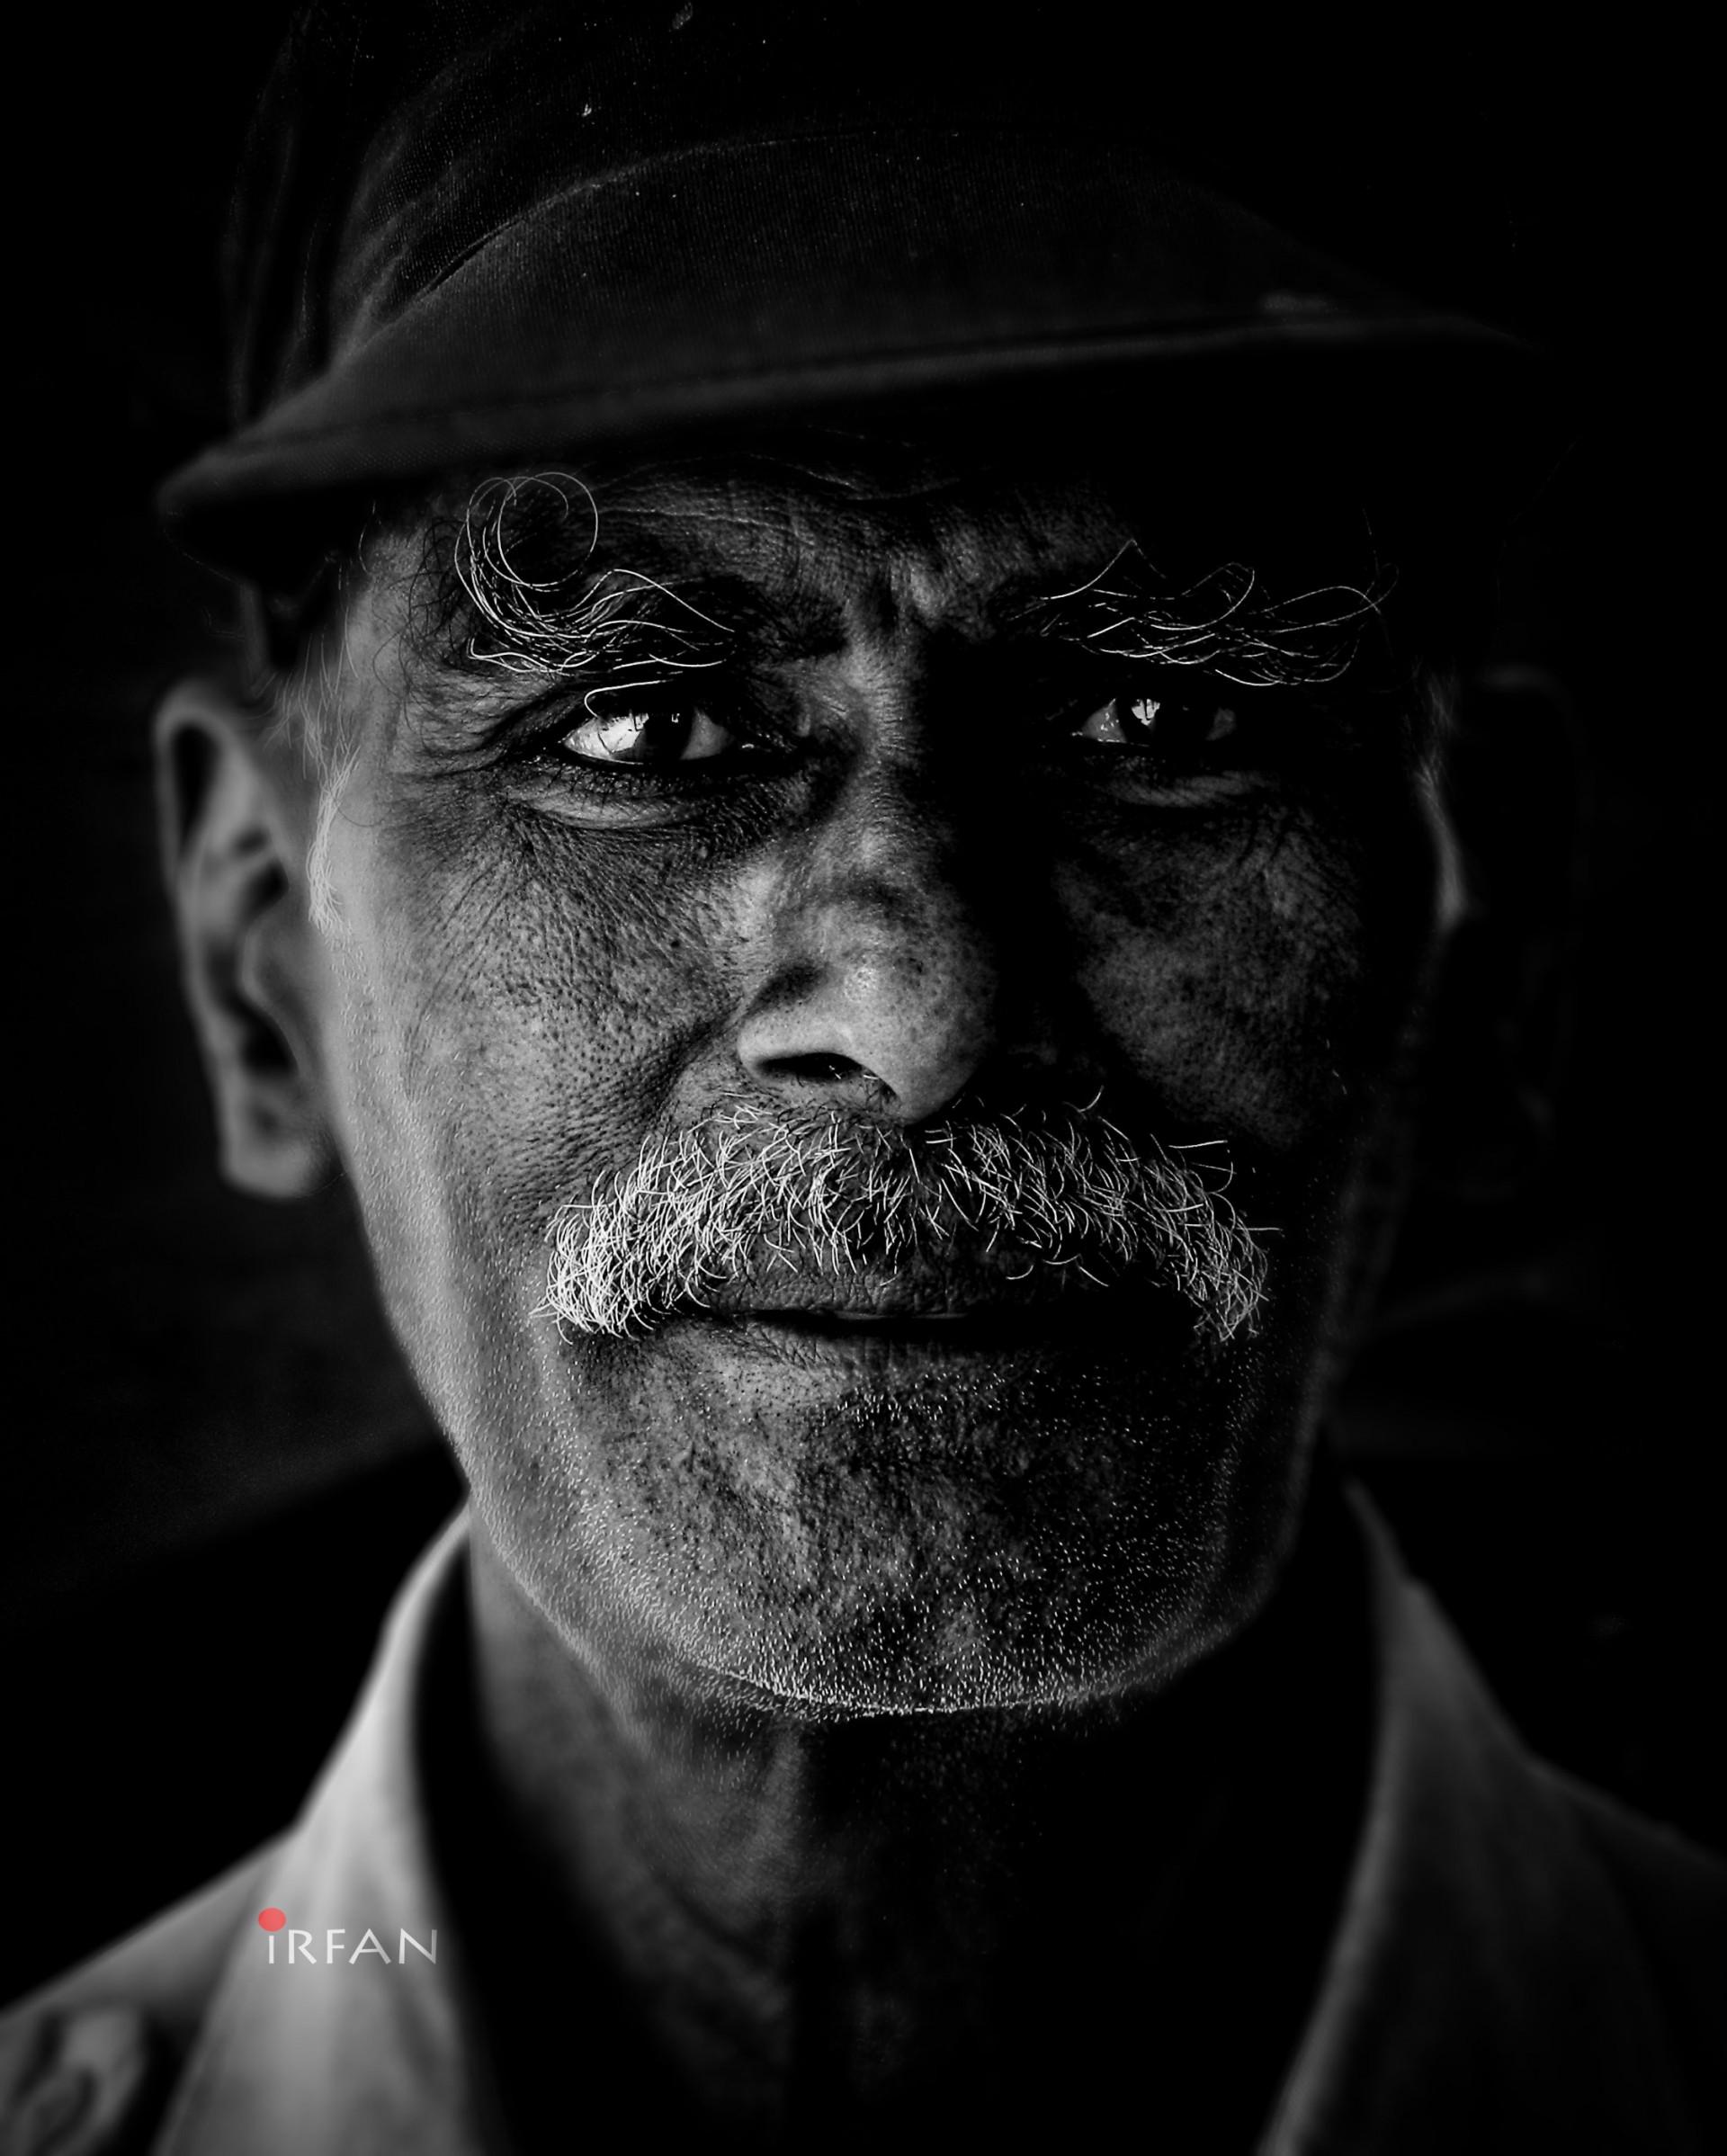 watch man, black and white, portraits, irfan hussain, thereddotman, irfan, hussain